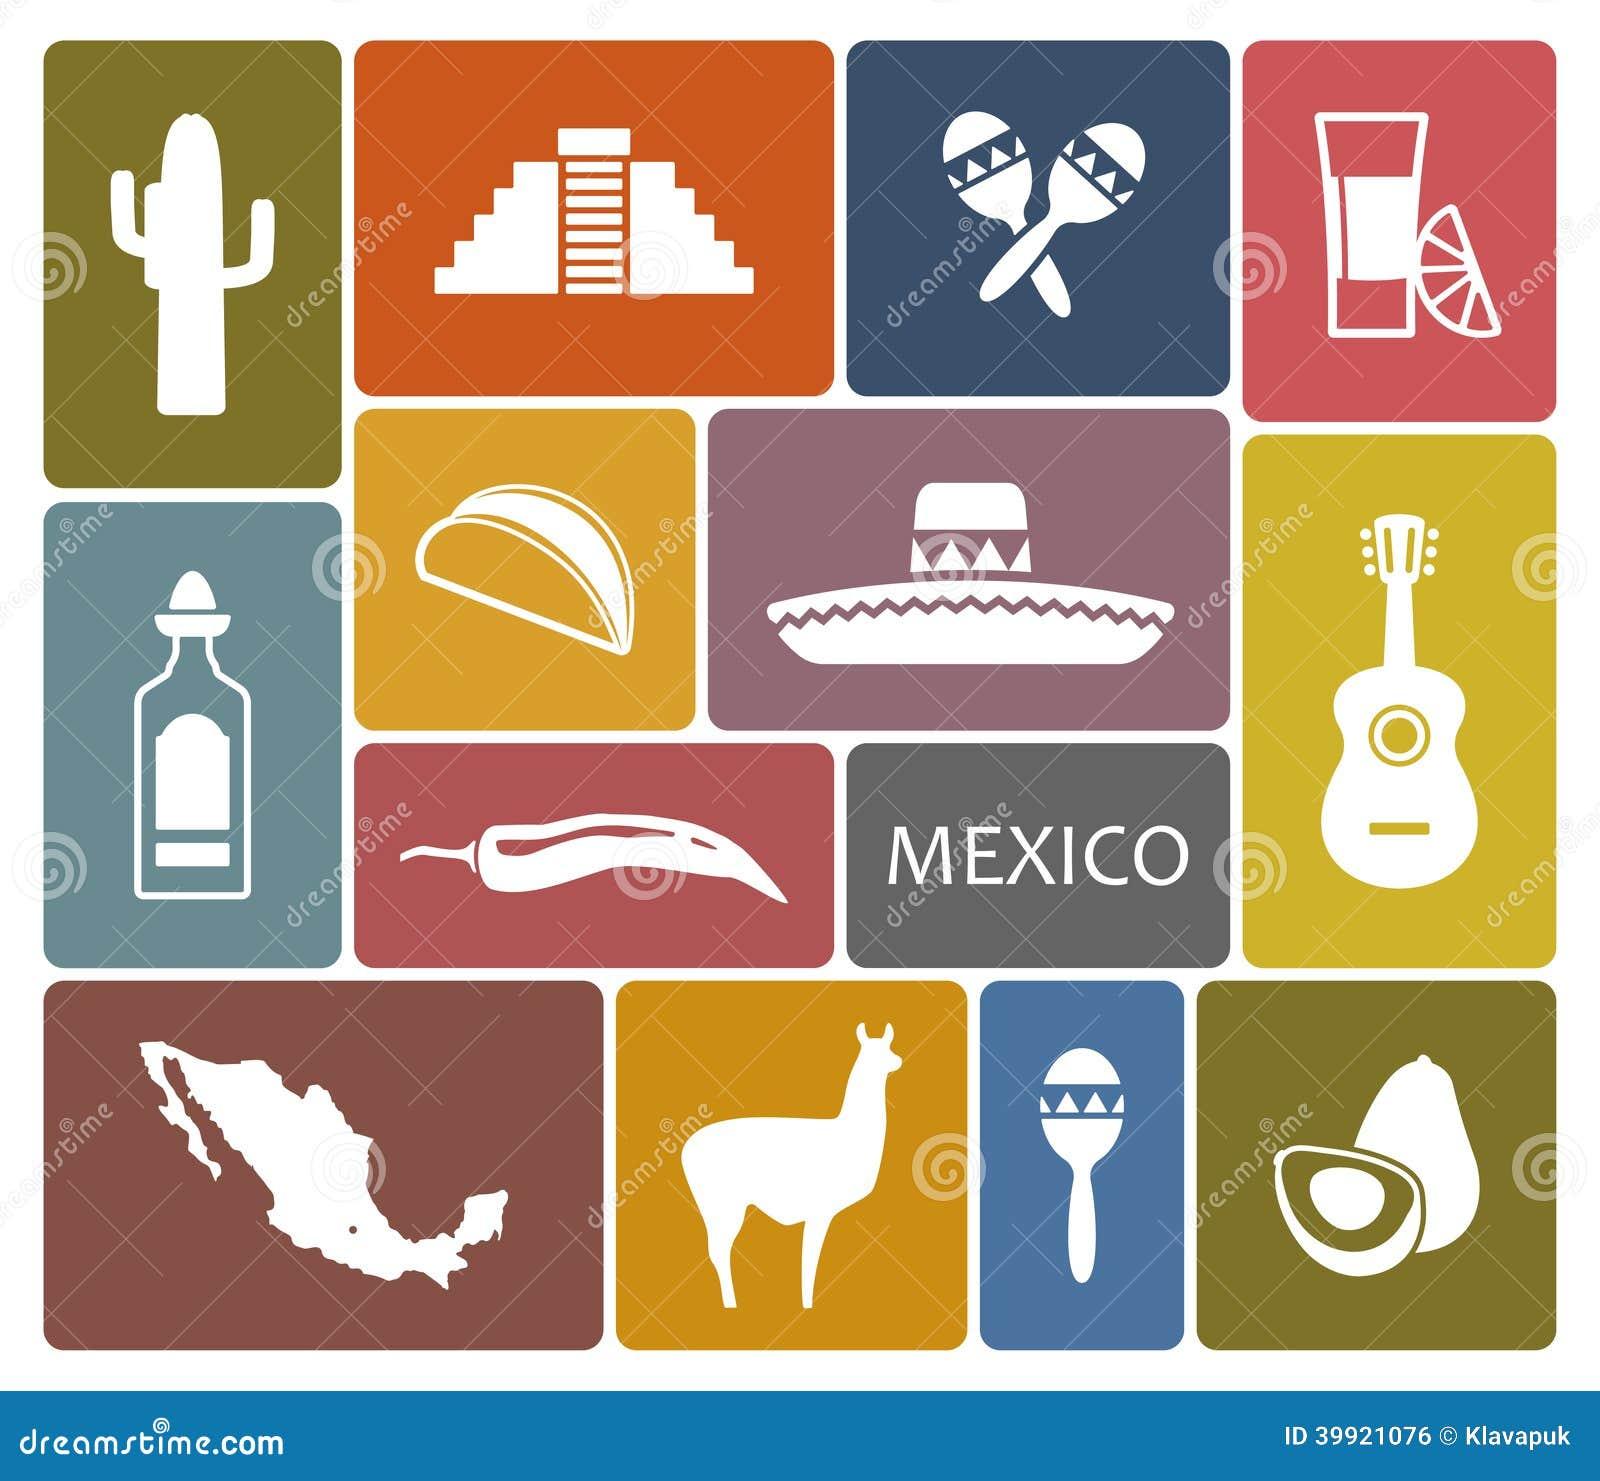 De pictogrammen van Mexico